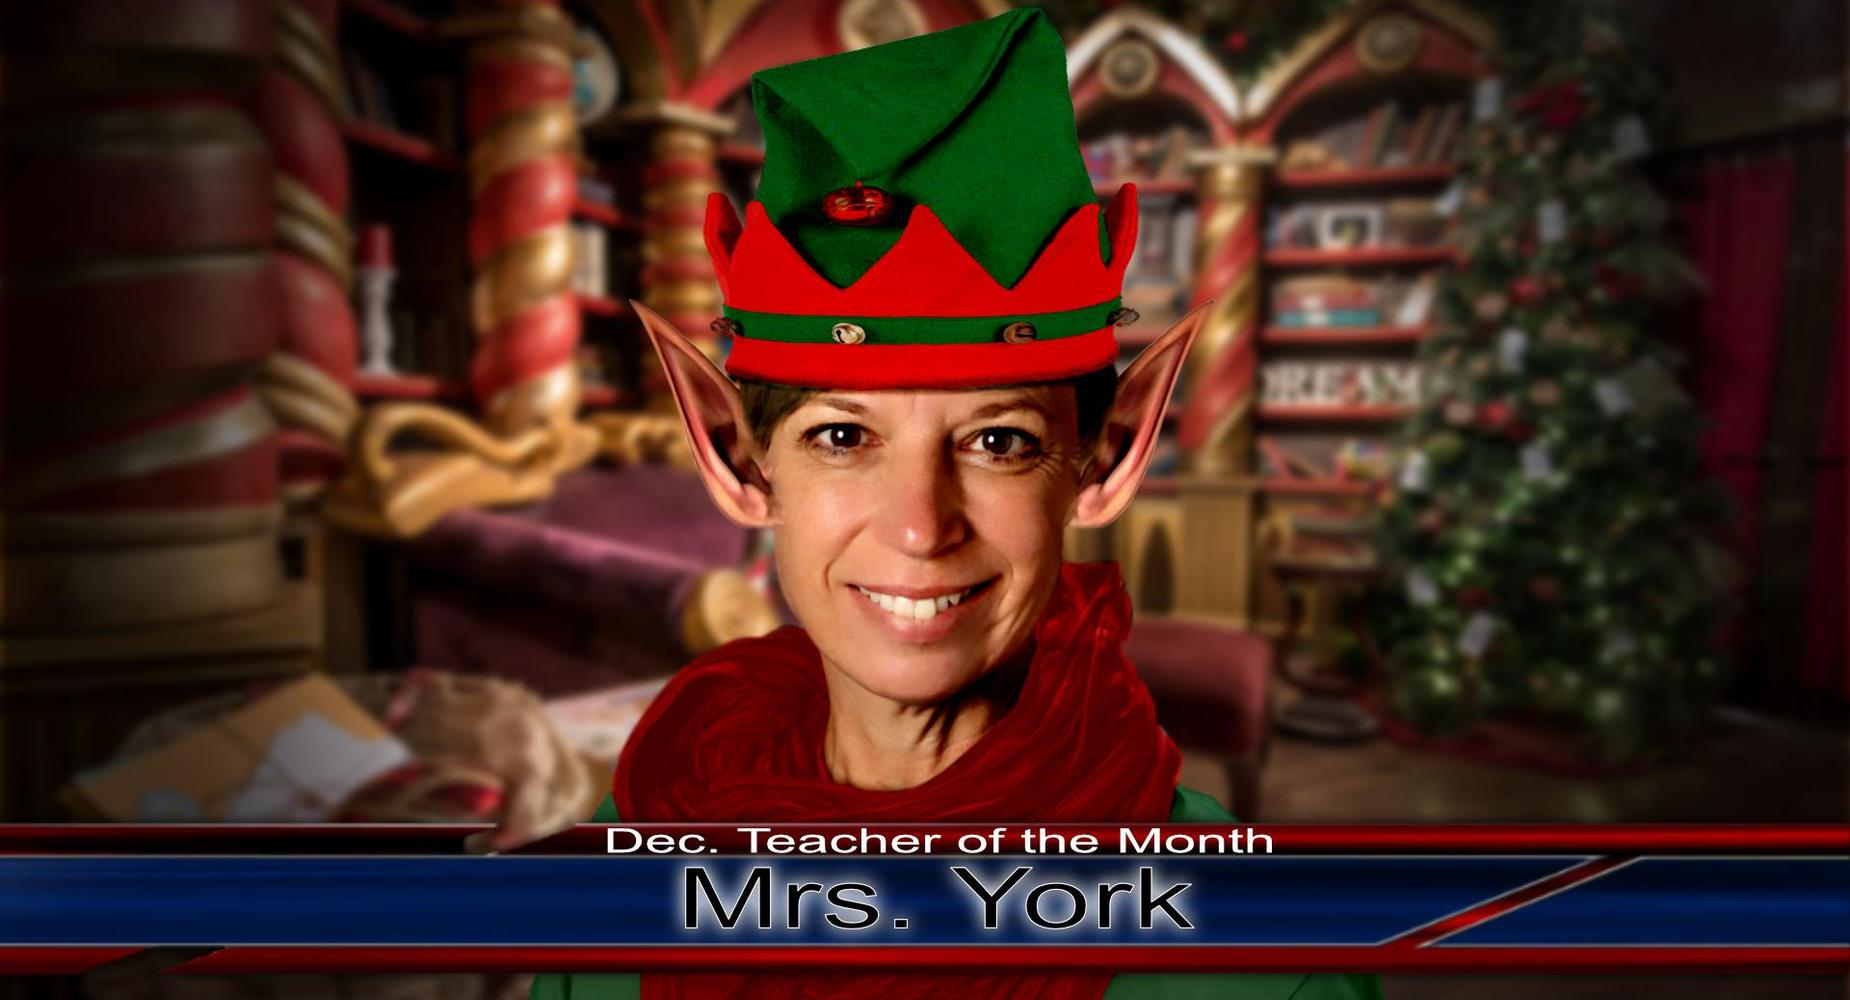 Teacher of the Month - Mrs. York